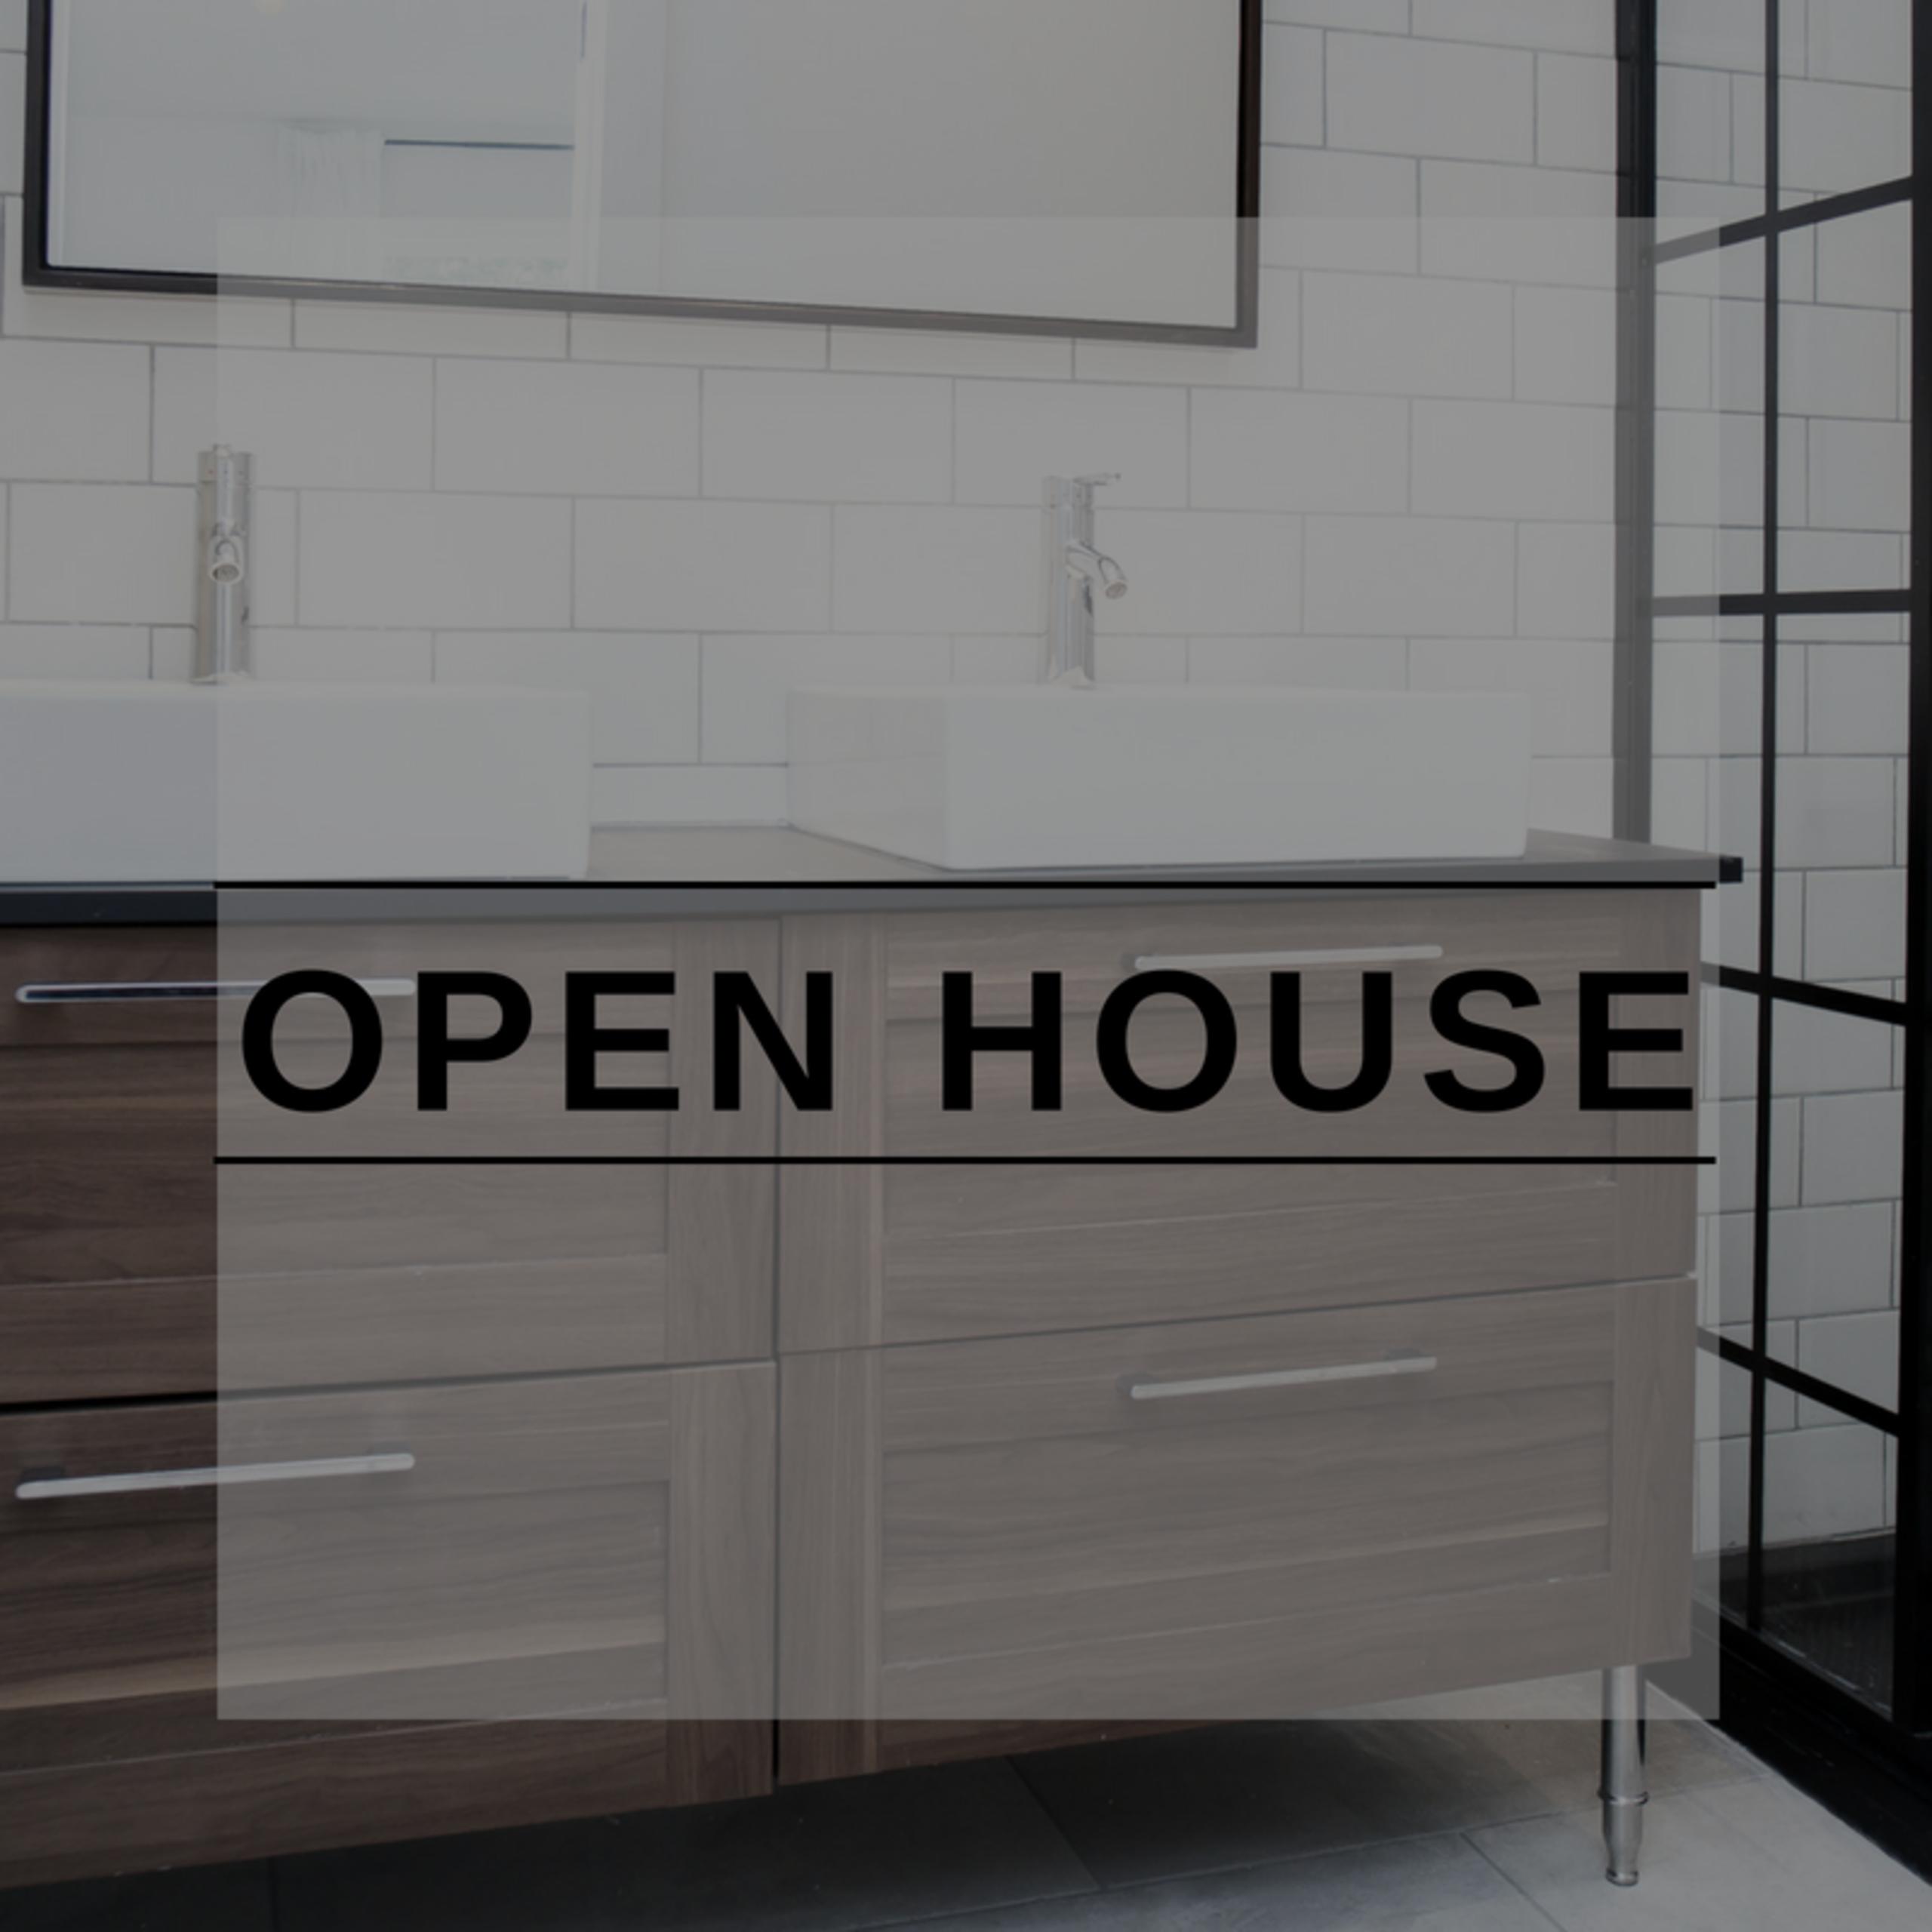 OPEN HOUSE LIST 8/4/18 – 8/5/18